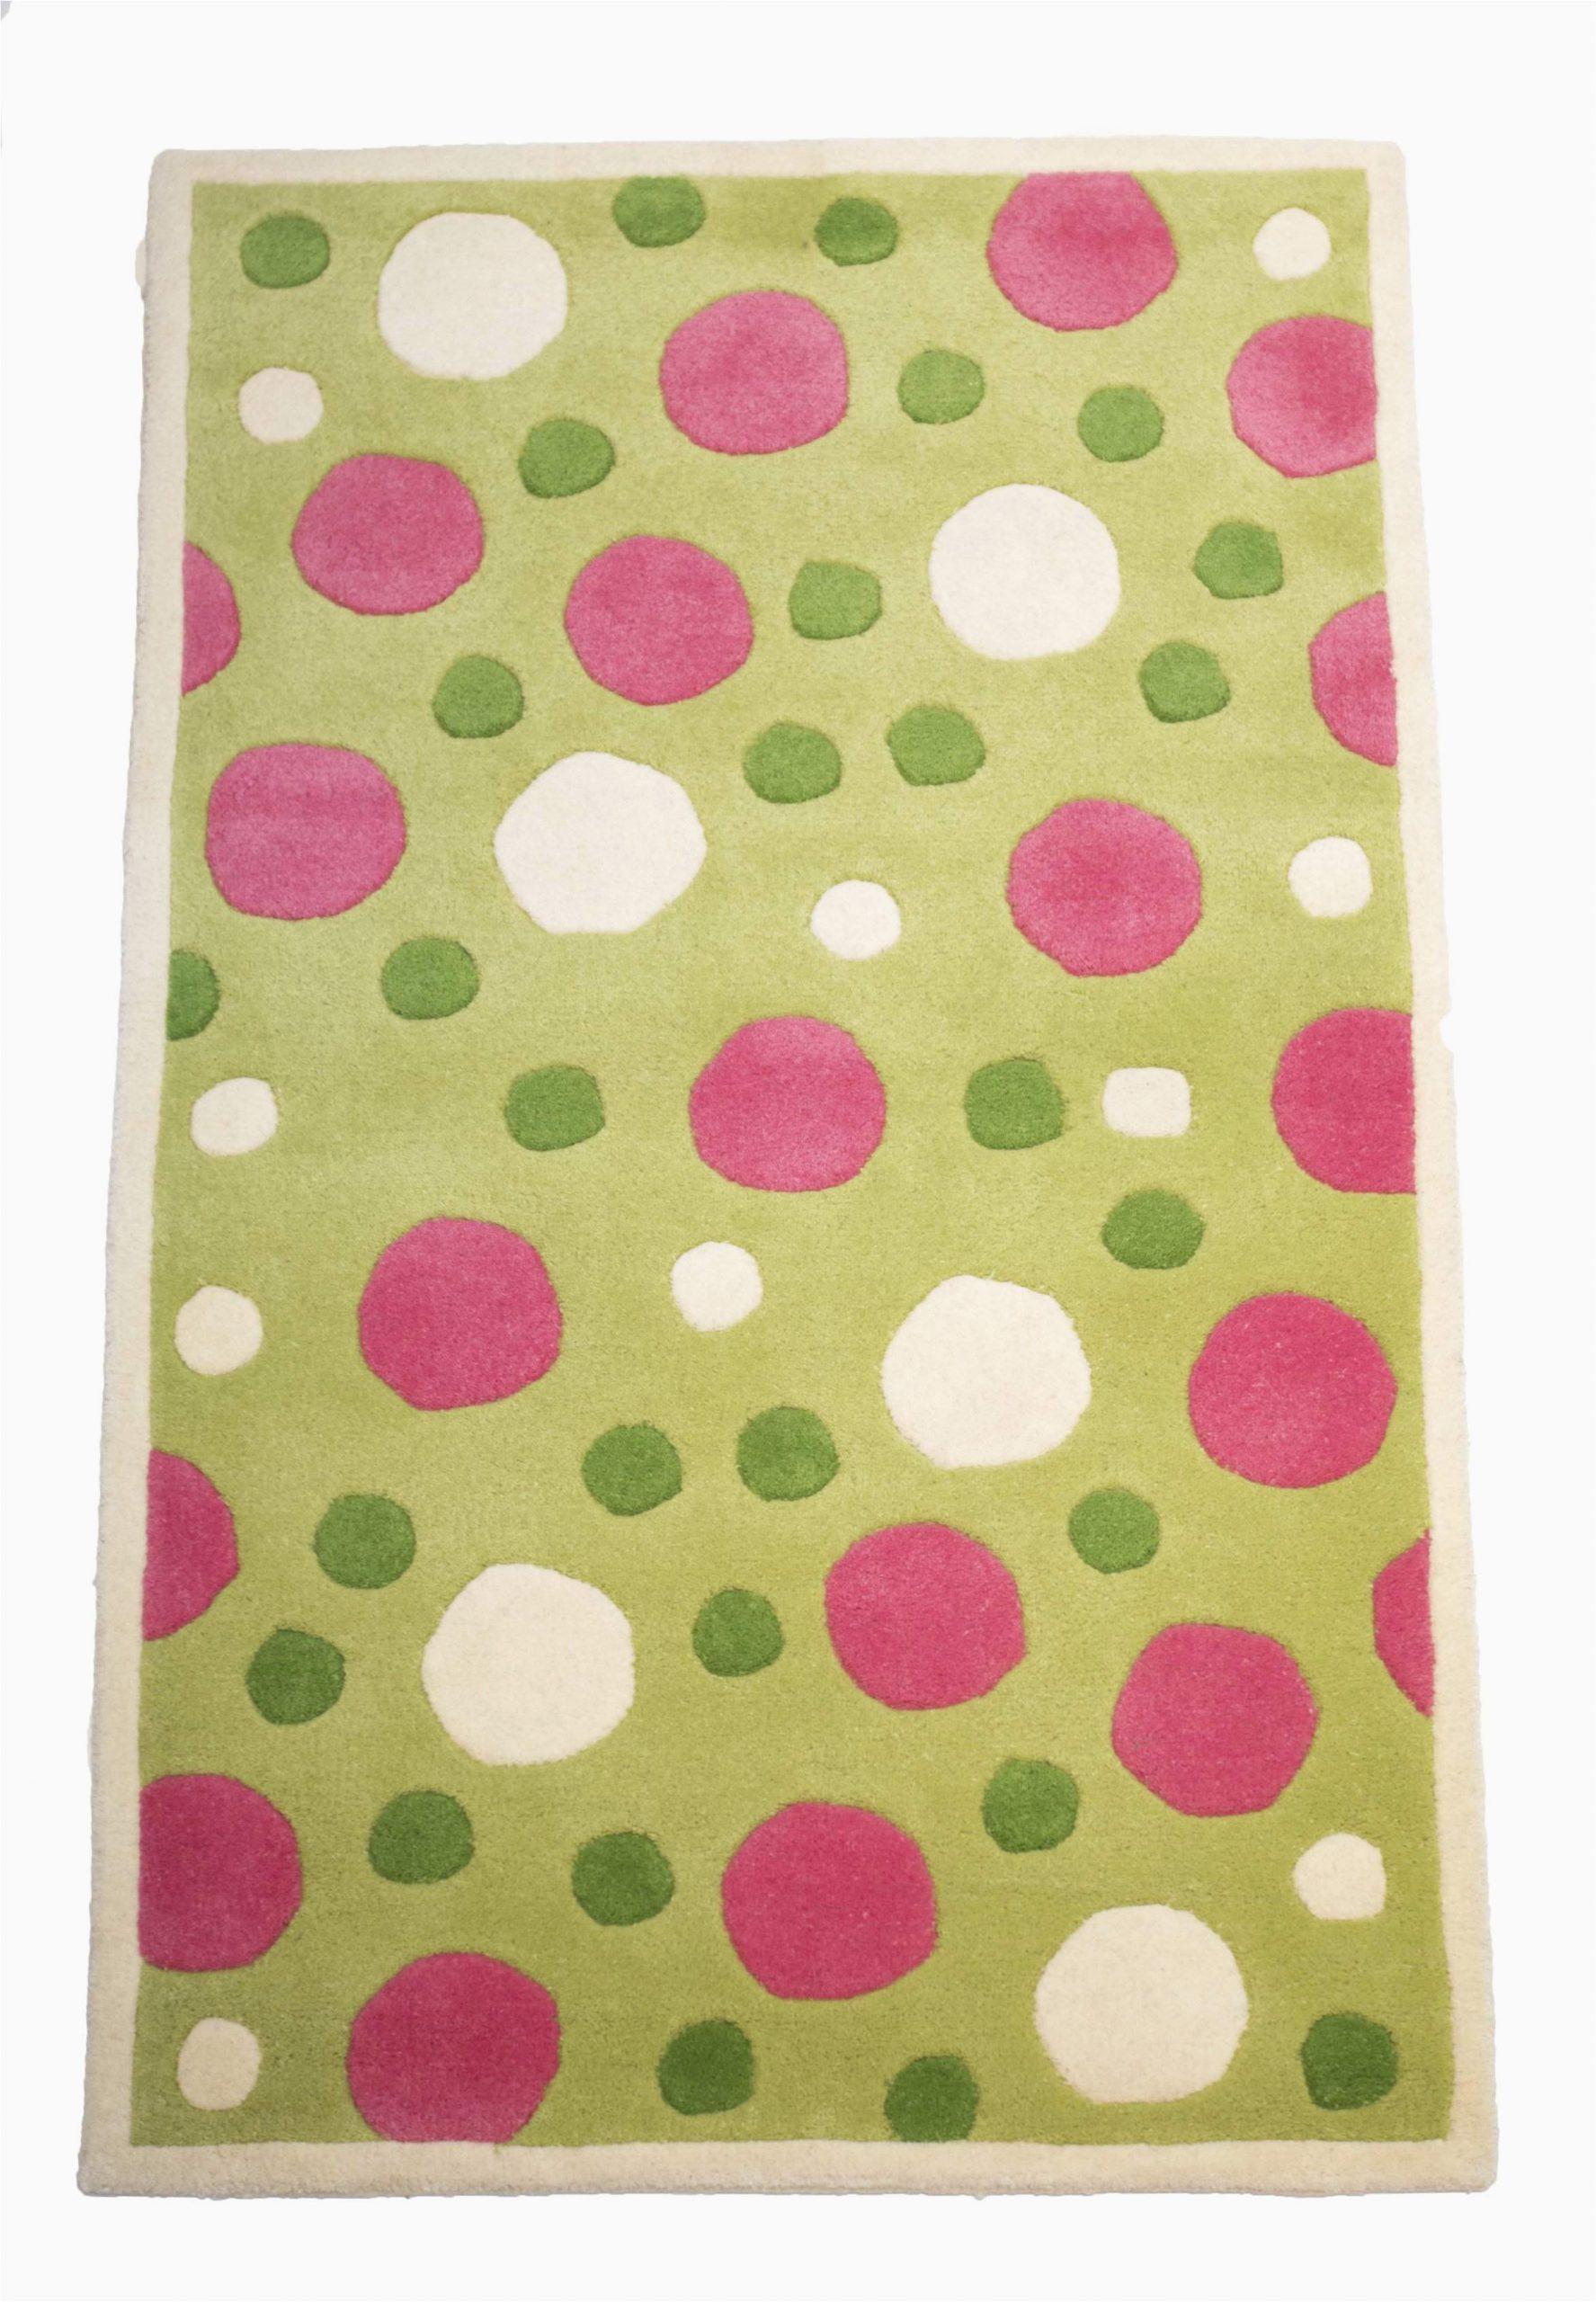 Green and pink polka dot kids room rug rsm3685 rug shop and more 2348x